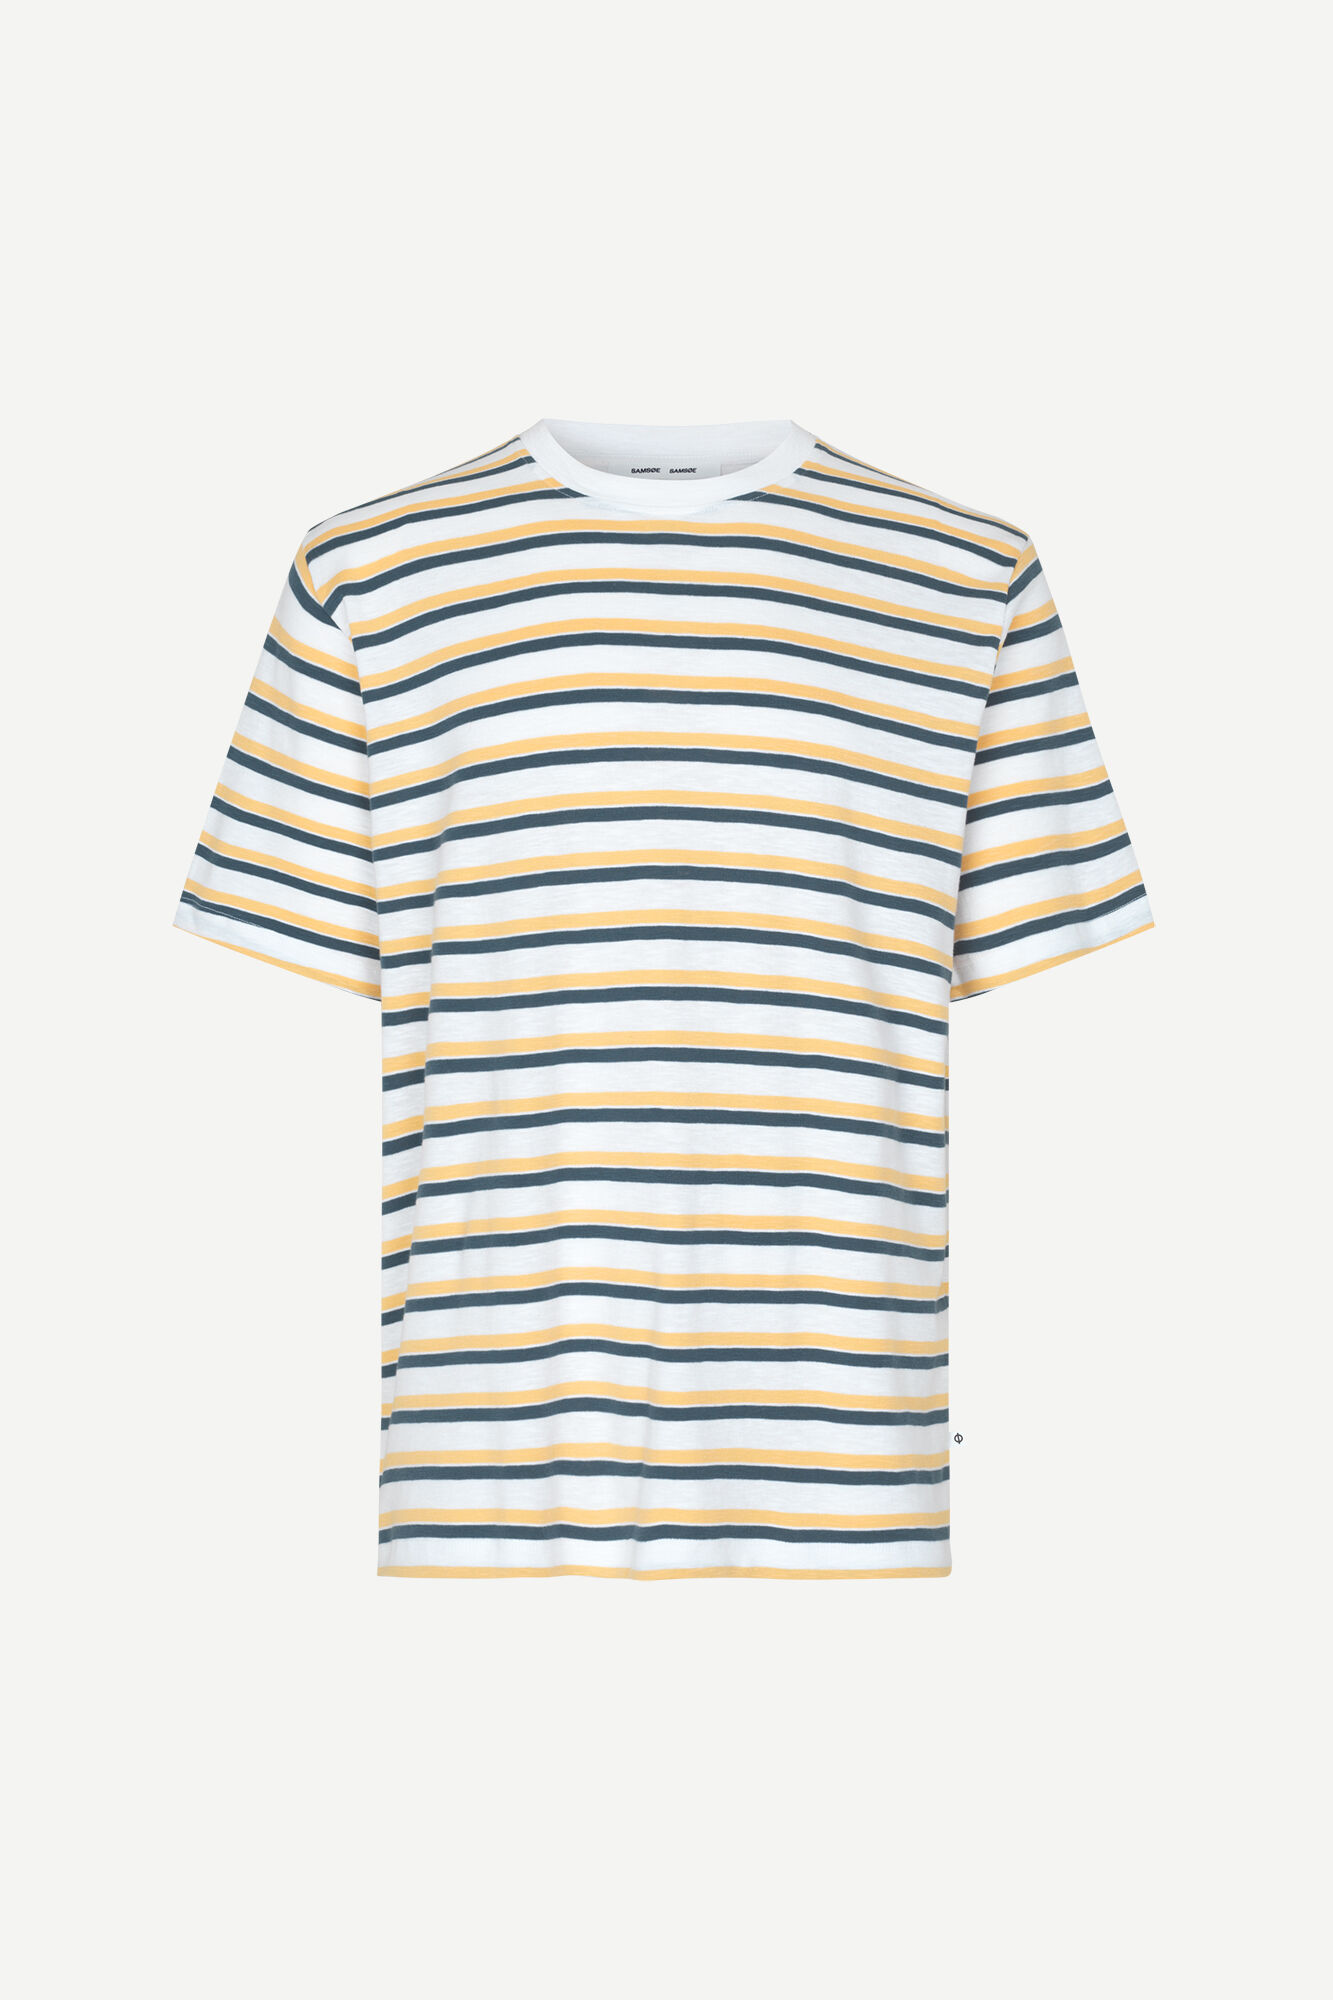 Ataro t-shirt st 11566, SAHARA SUN ST.